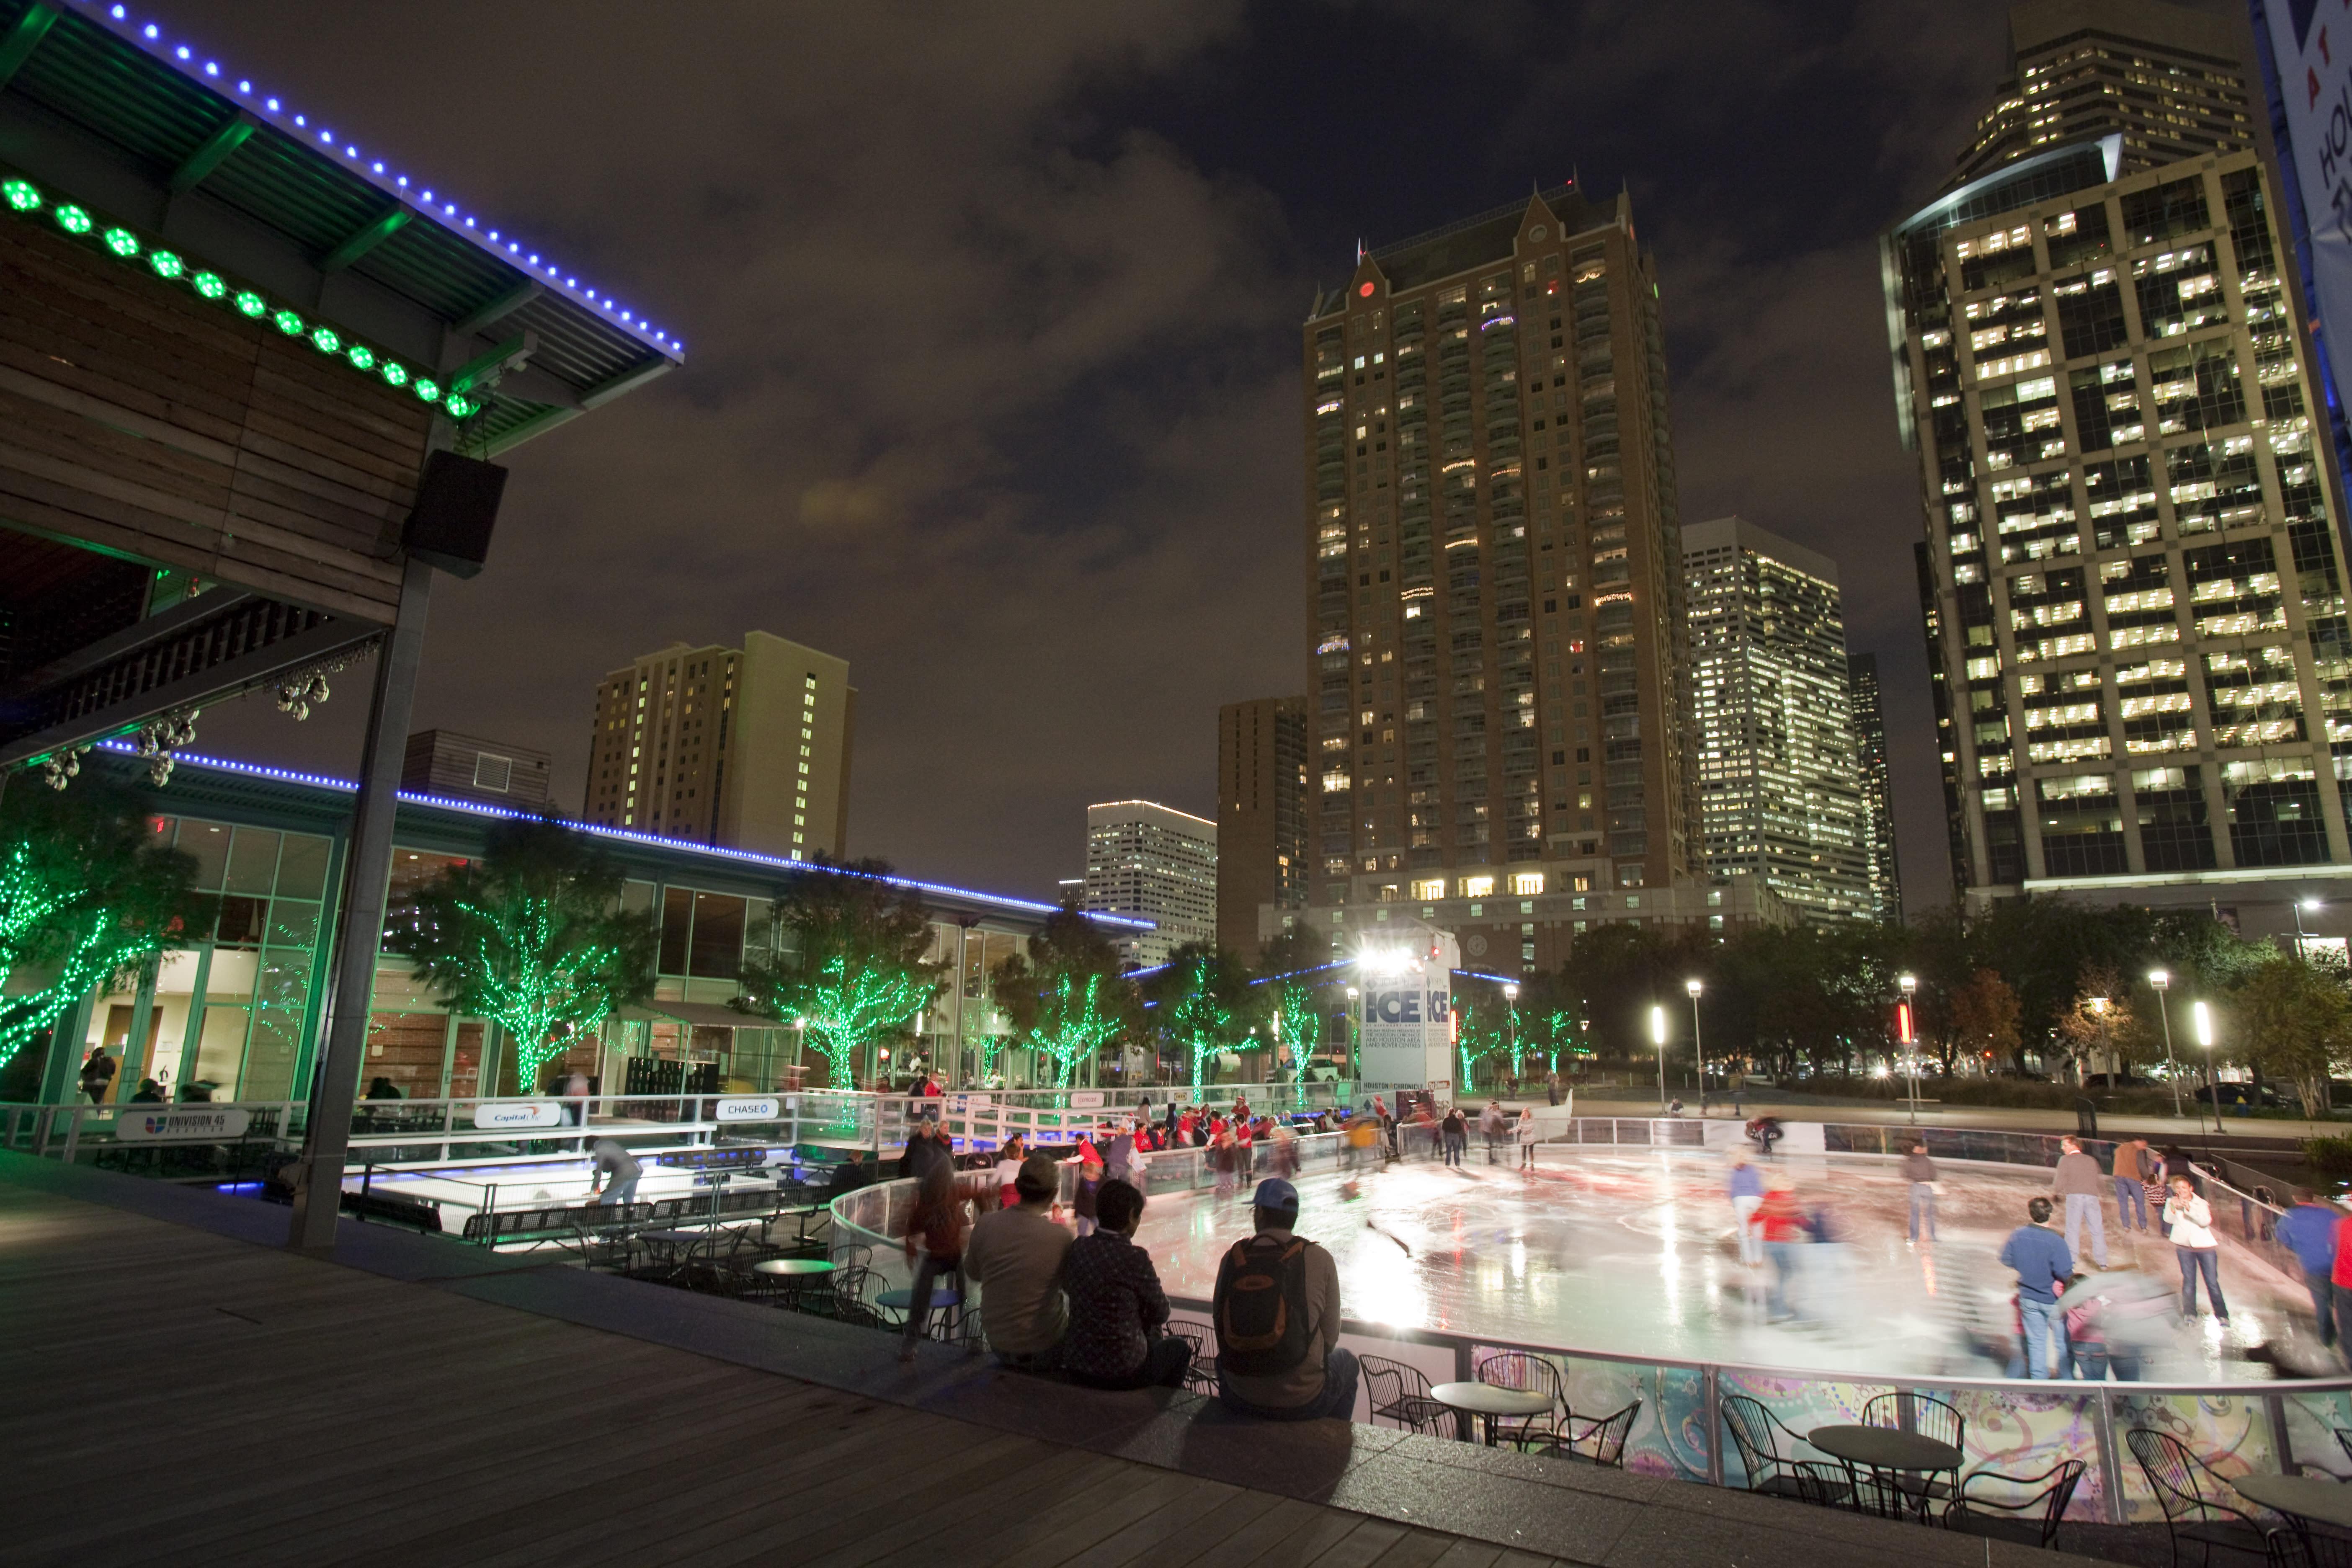 Ice Skating at Discovery Green (night)